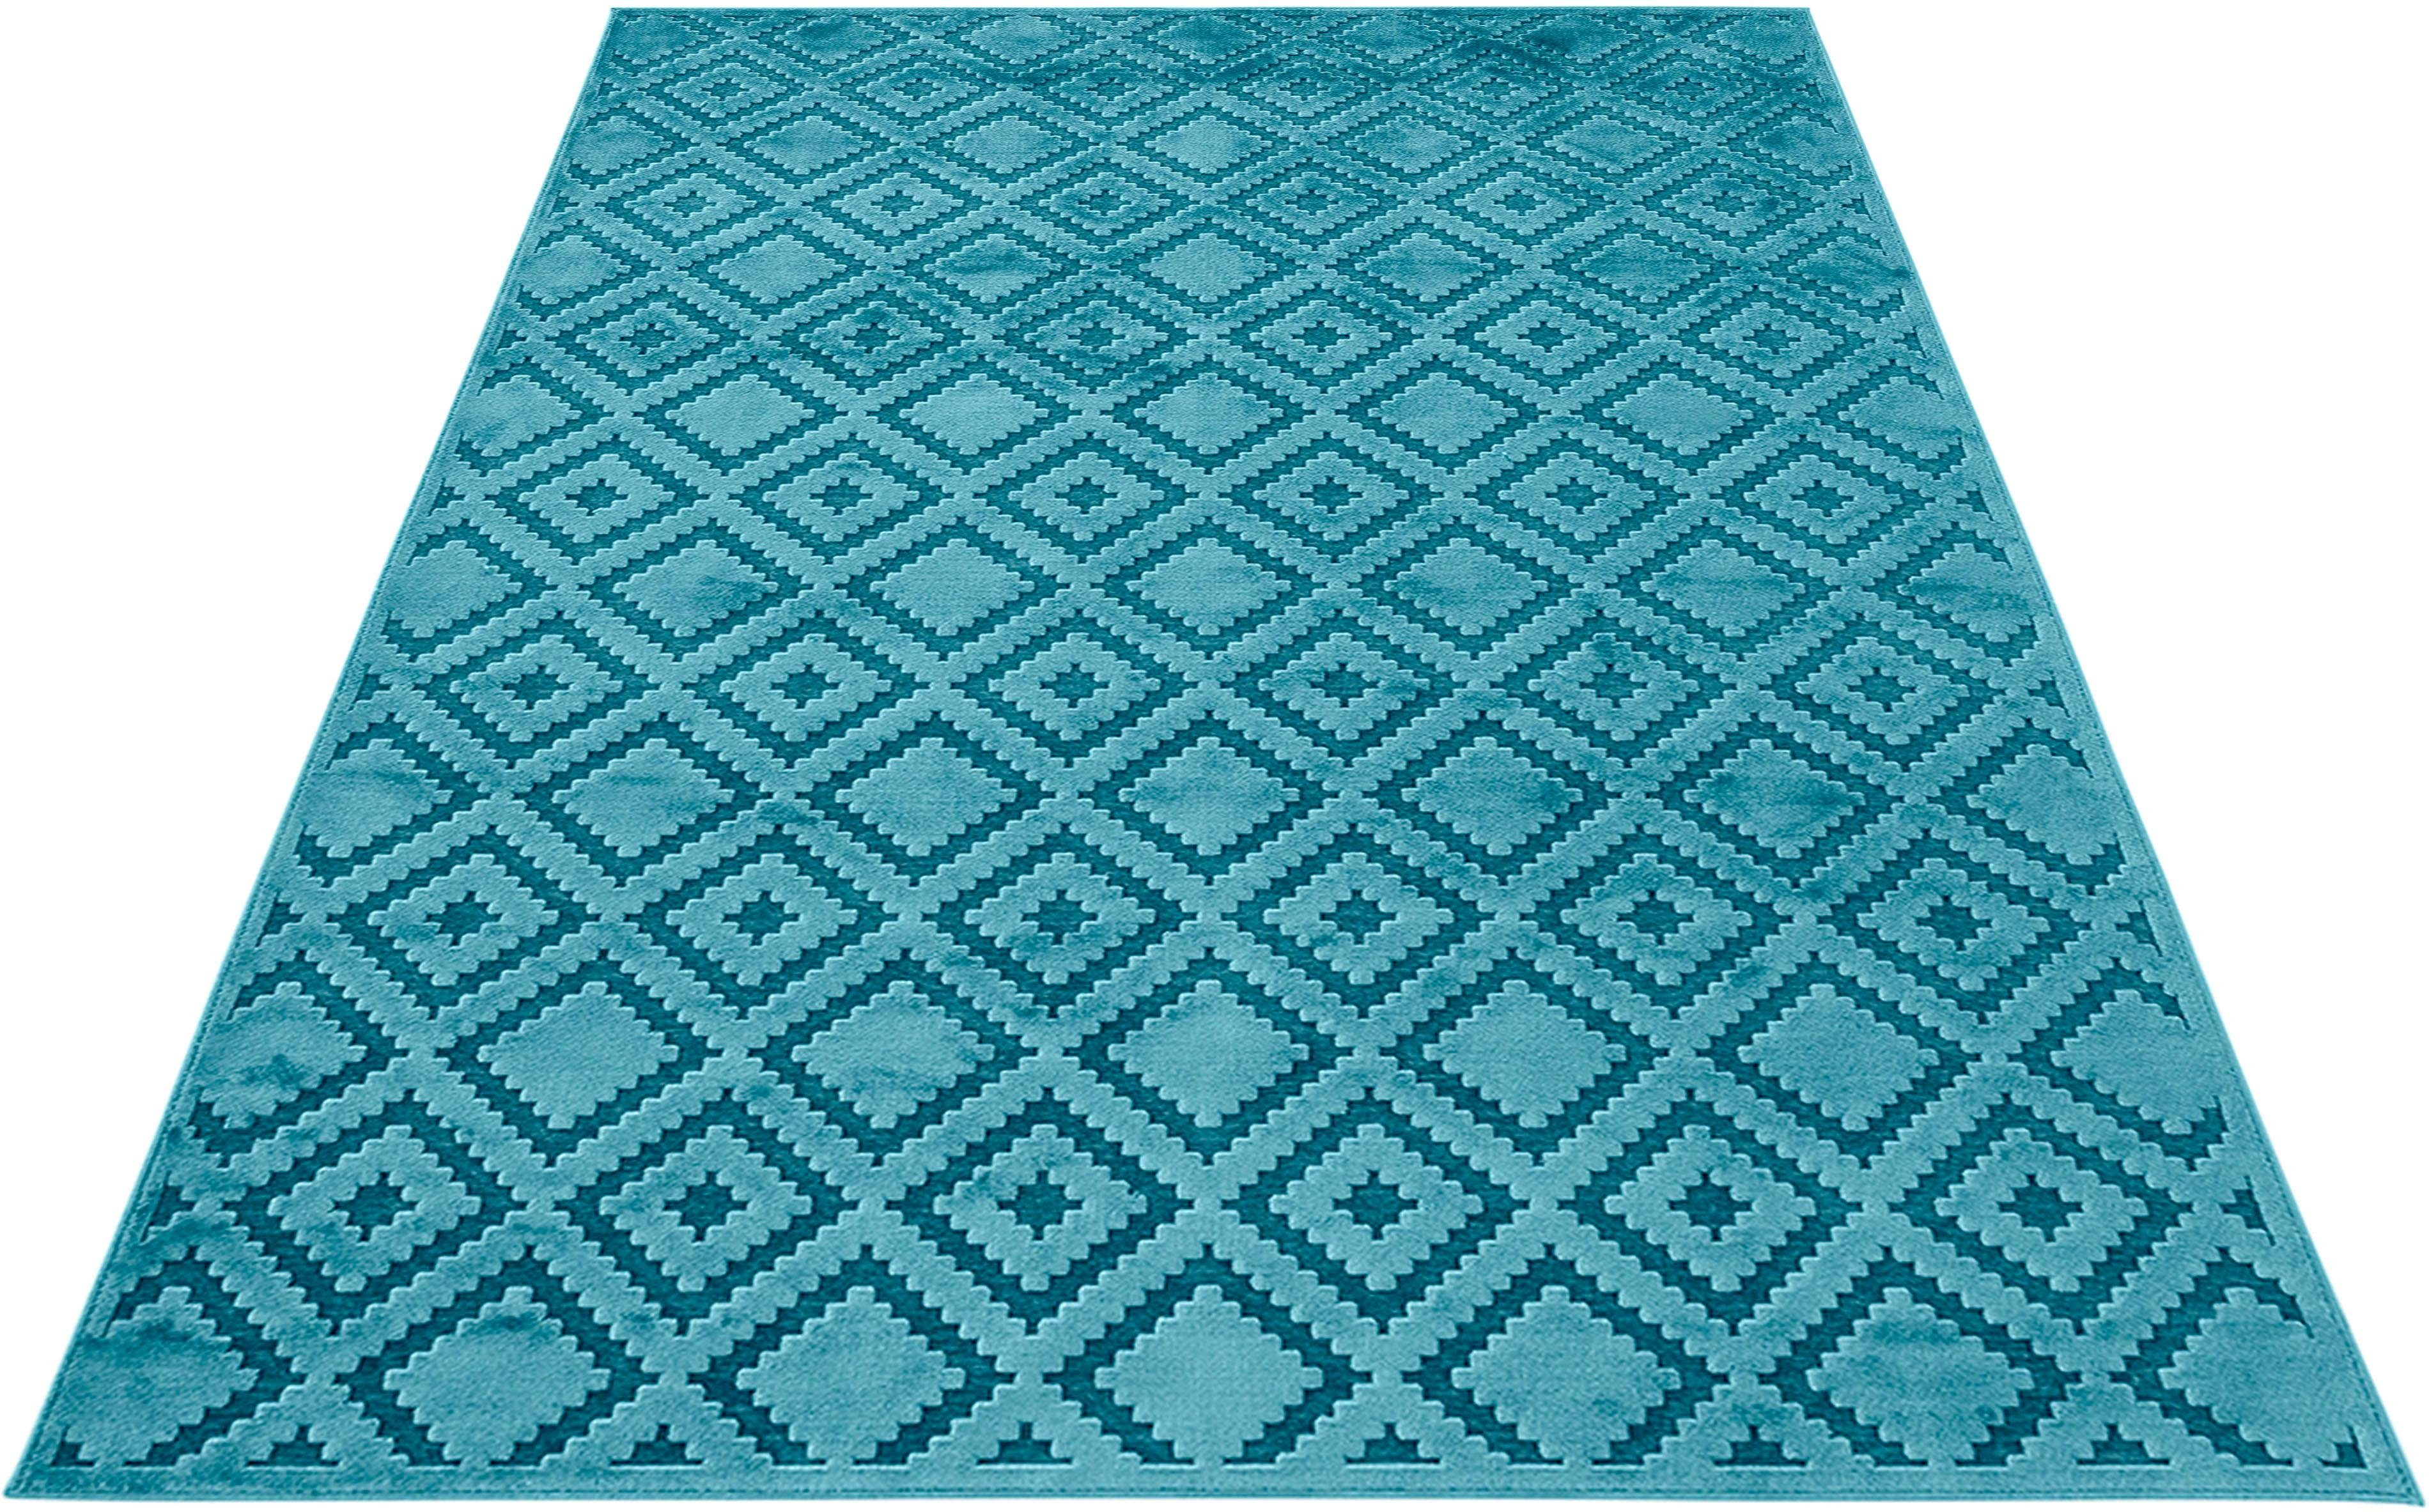 teppich iris mint rugs rechteckig h he 4 mm. Black Bedroom Furniture Sets. Home Design Ideas